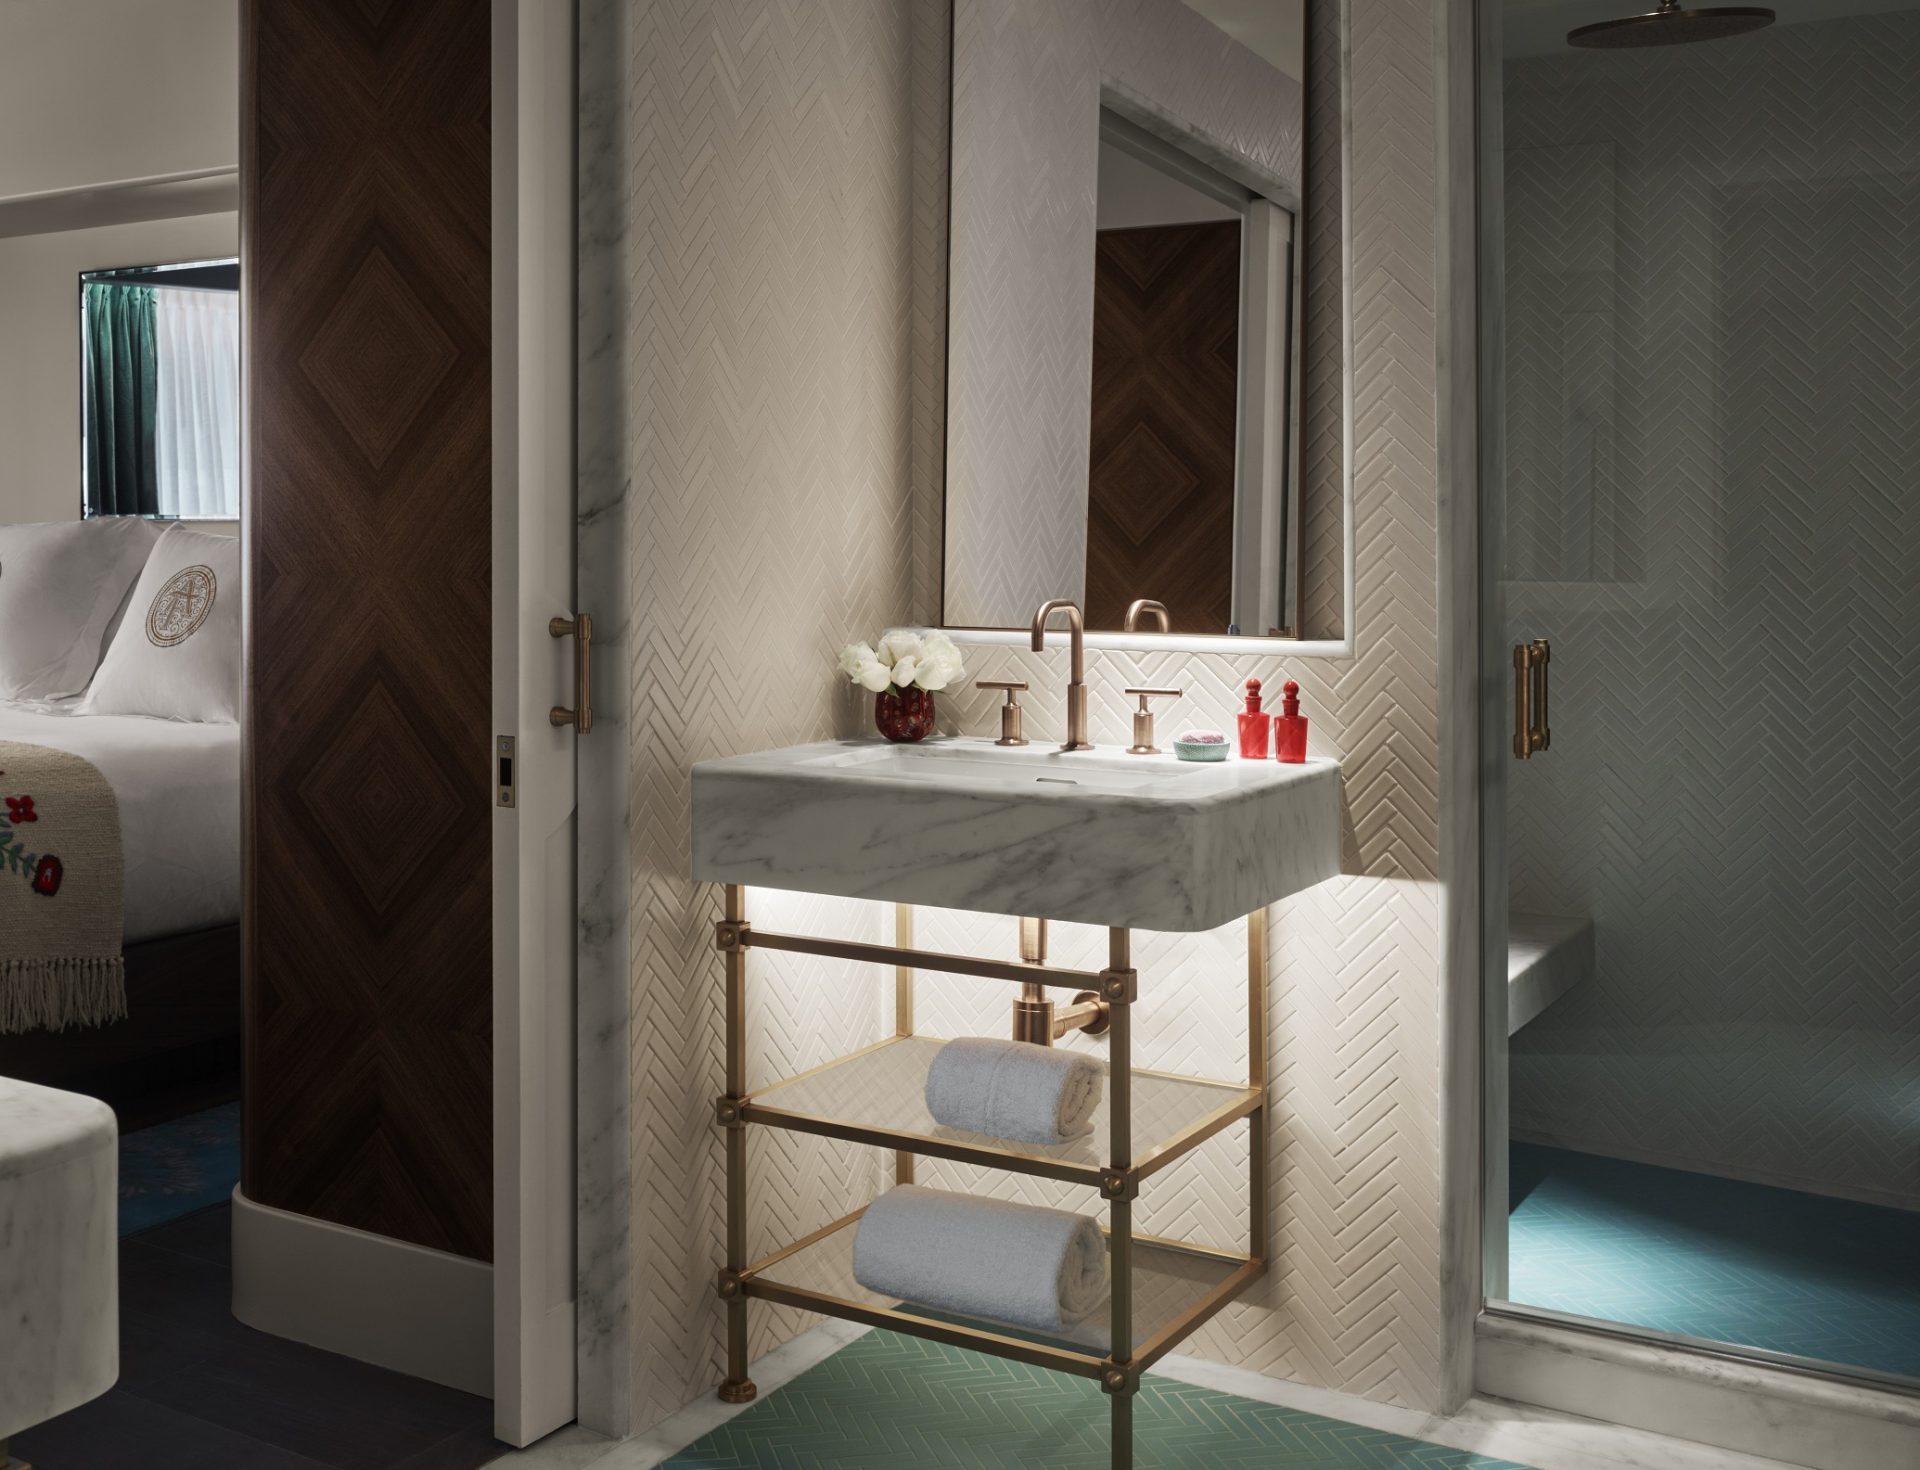 Carrara marble bathrooms